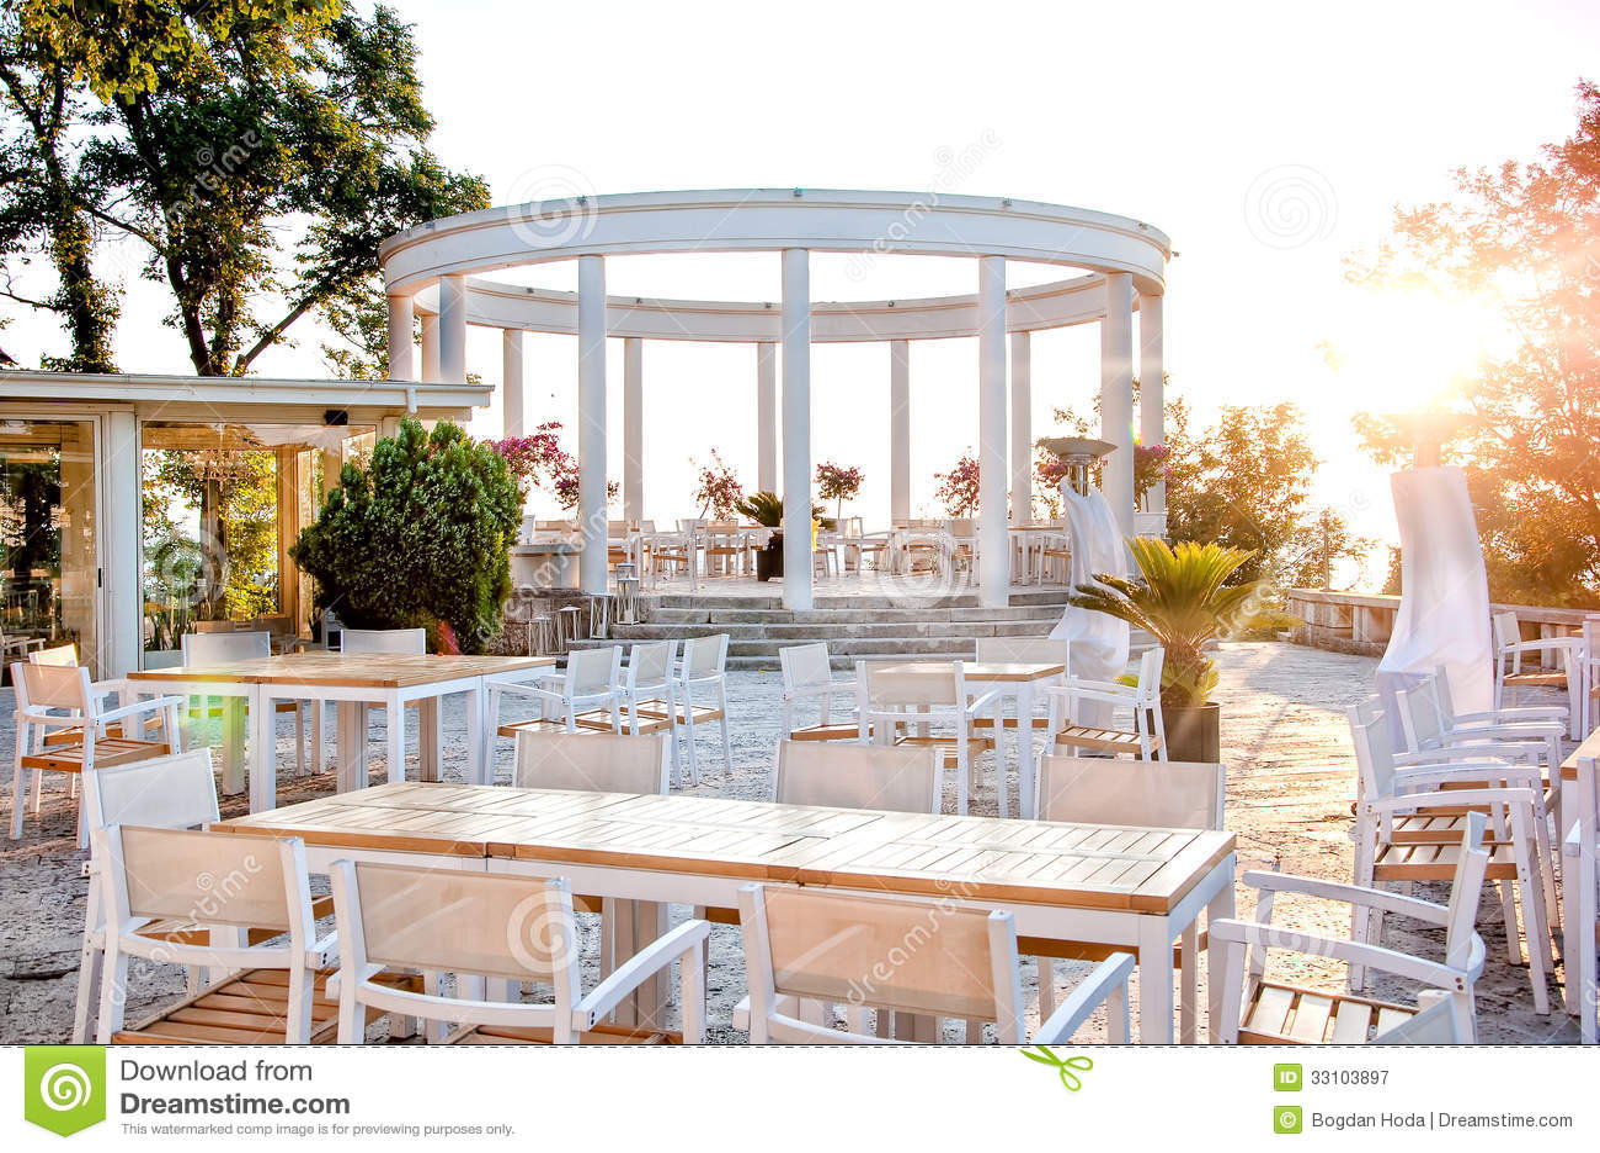 Beautiful restaurant with terrace on ocean shore for for Restaurant with terrace